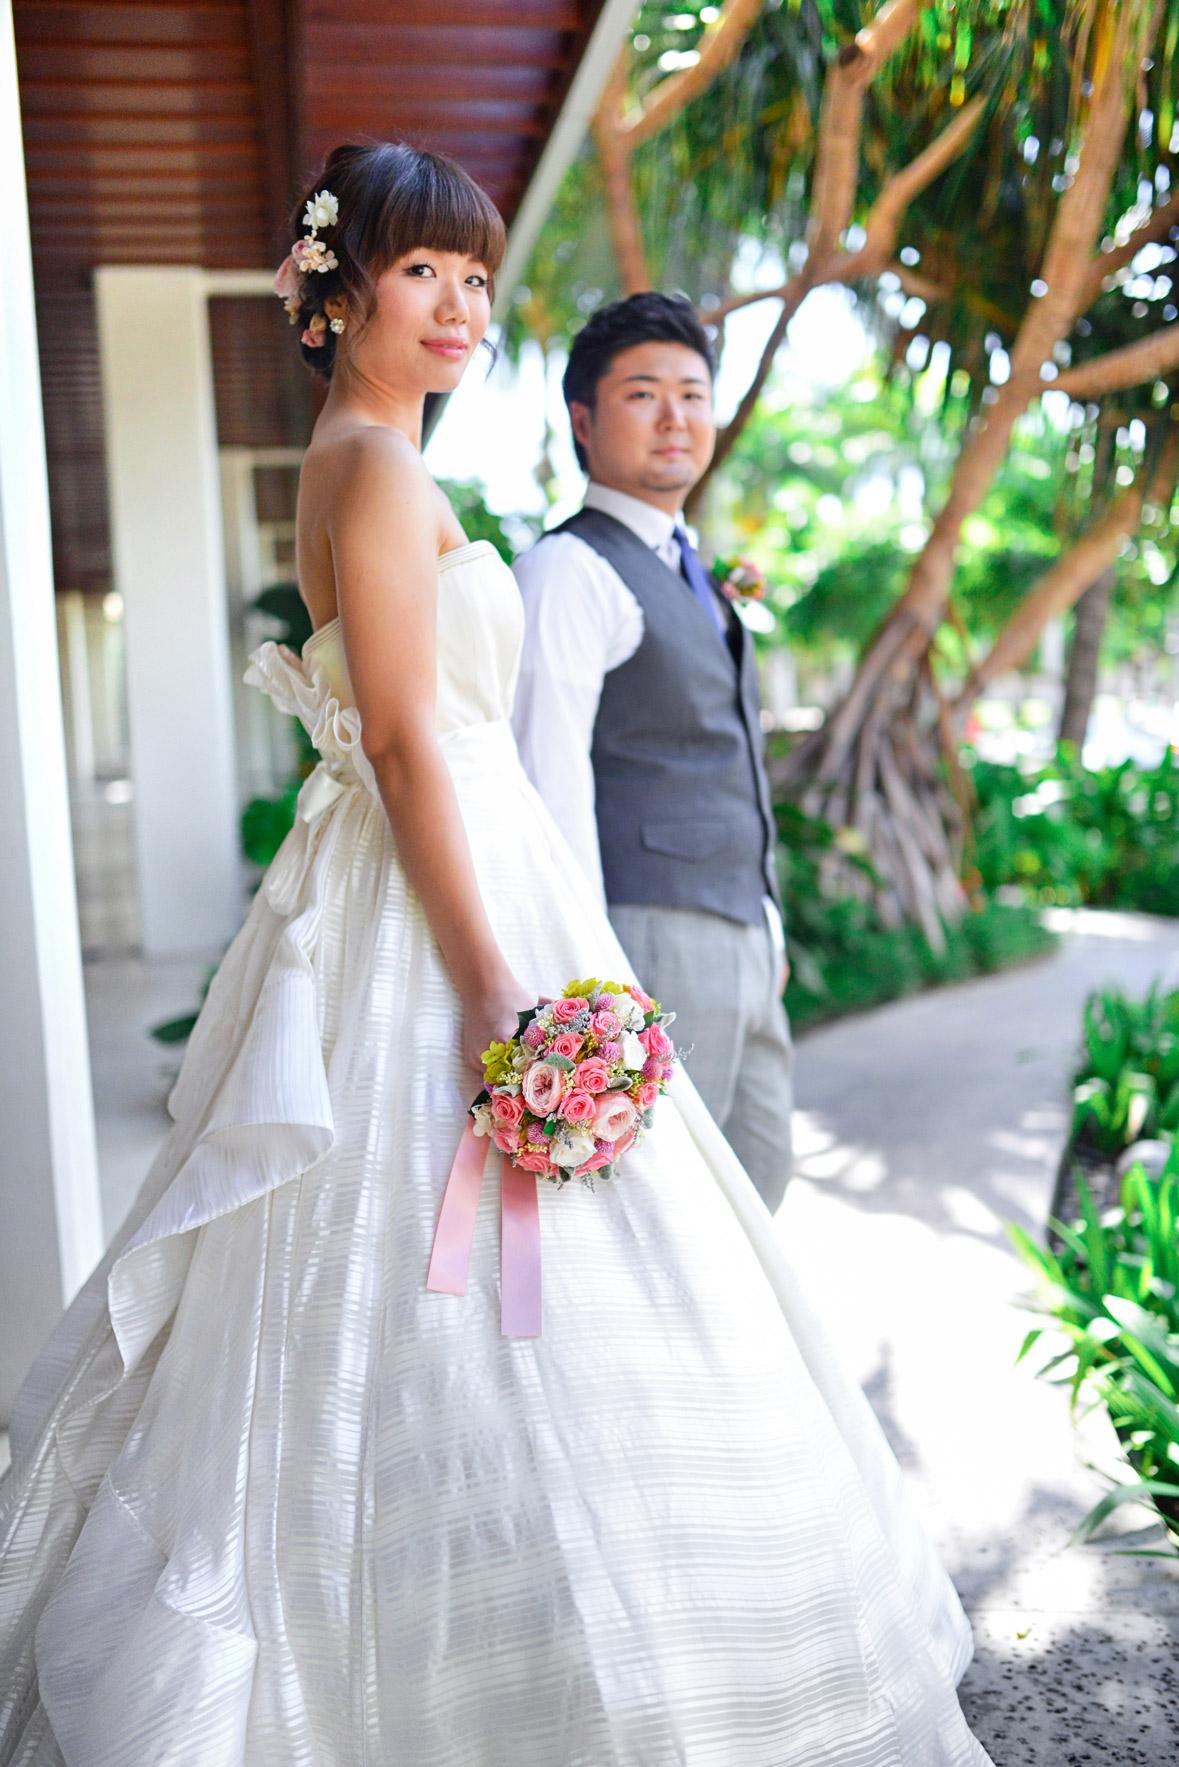 waikiki-beach-wedding-and-downtown-honolulu-hawaii-theater-stephen-ludwig-photography002.jpg